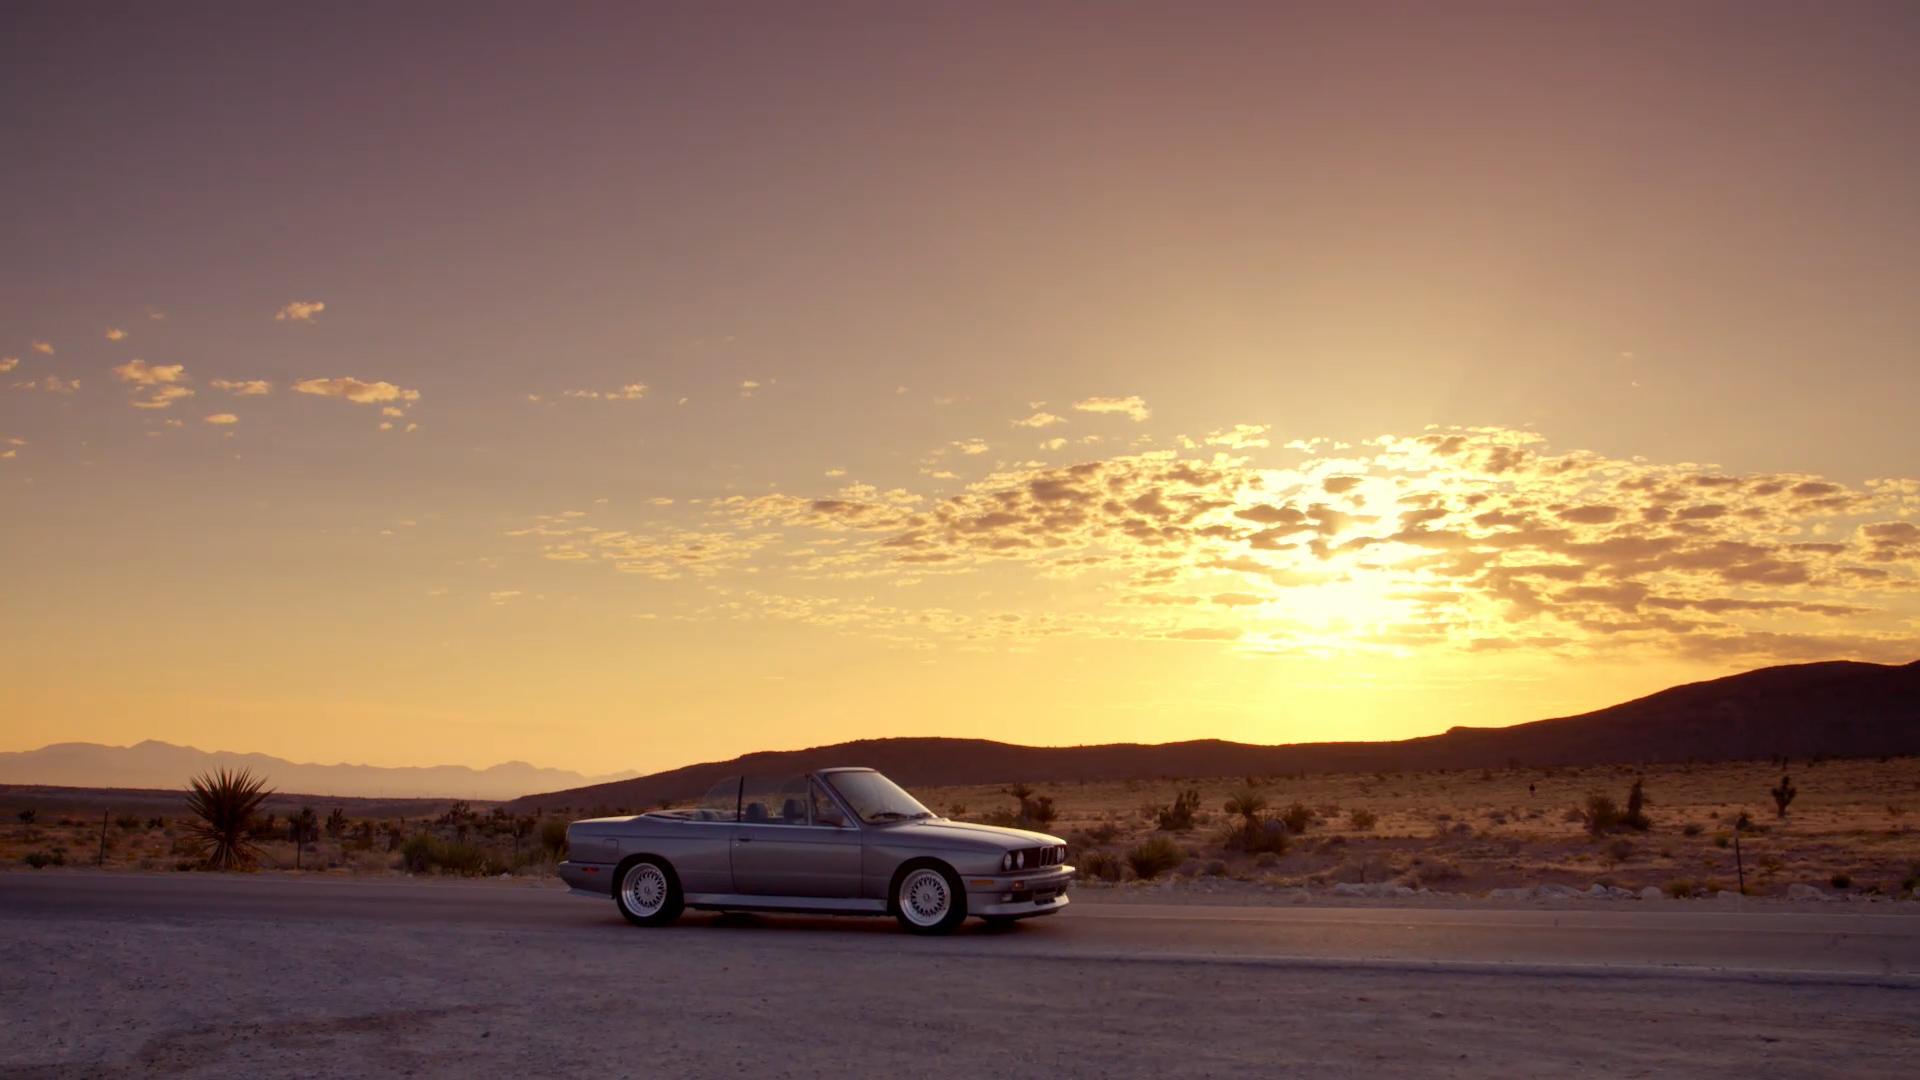 Sunrise - BMW 3 Series